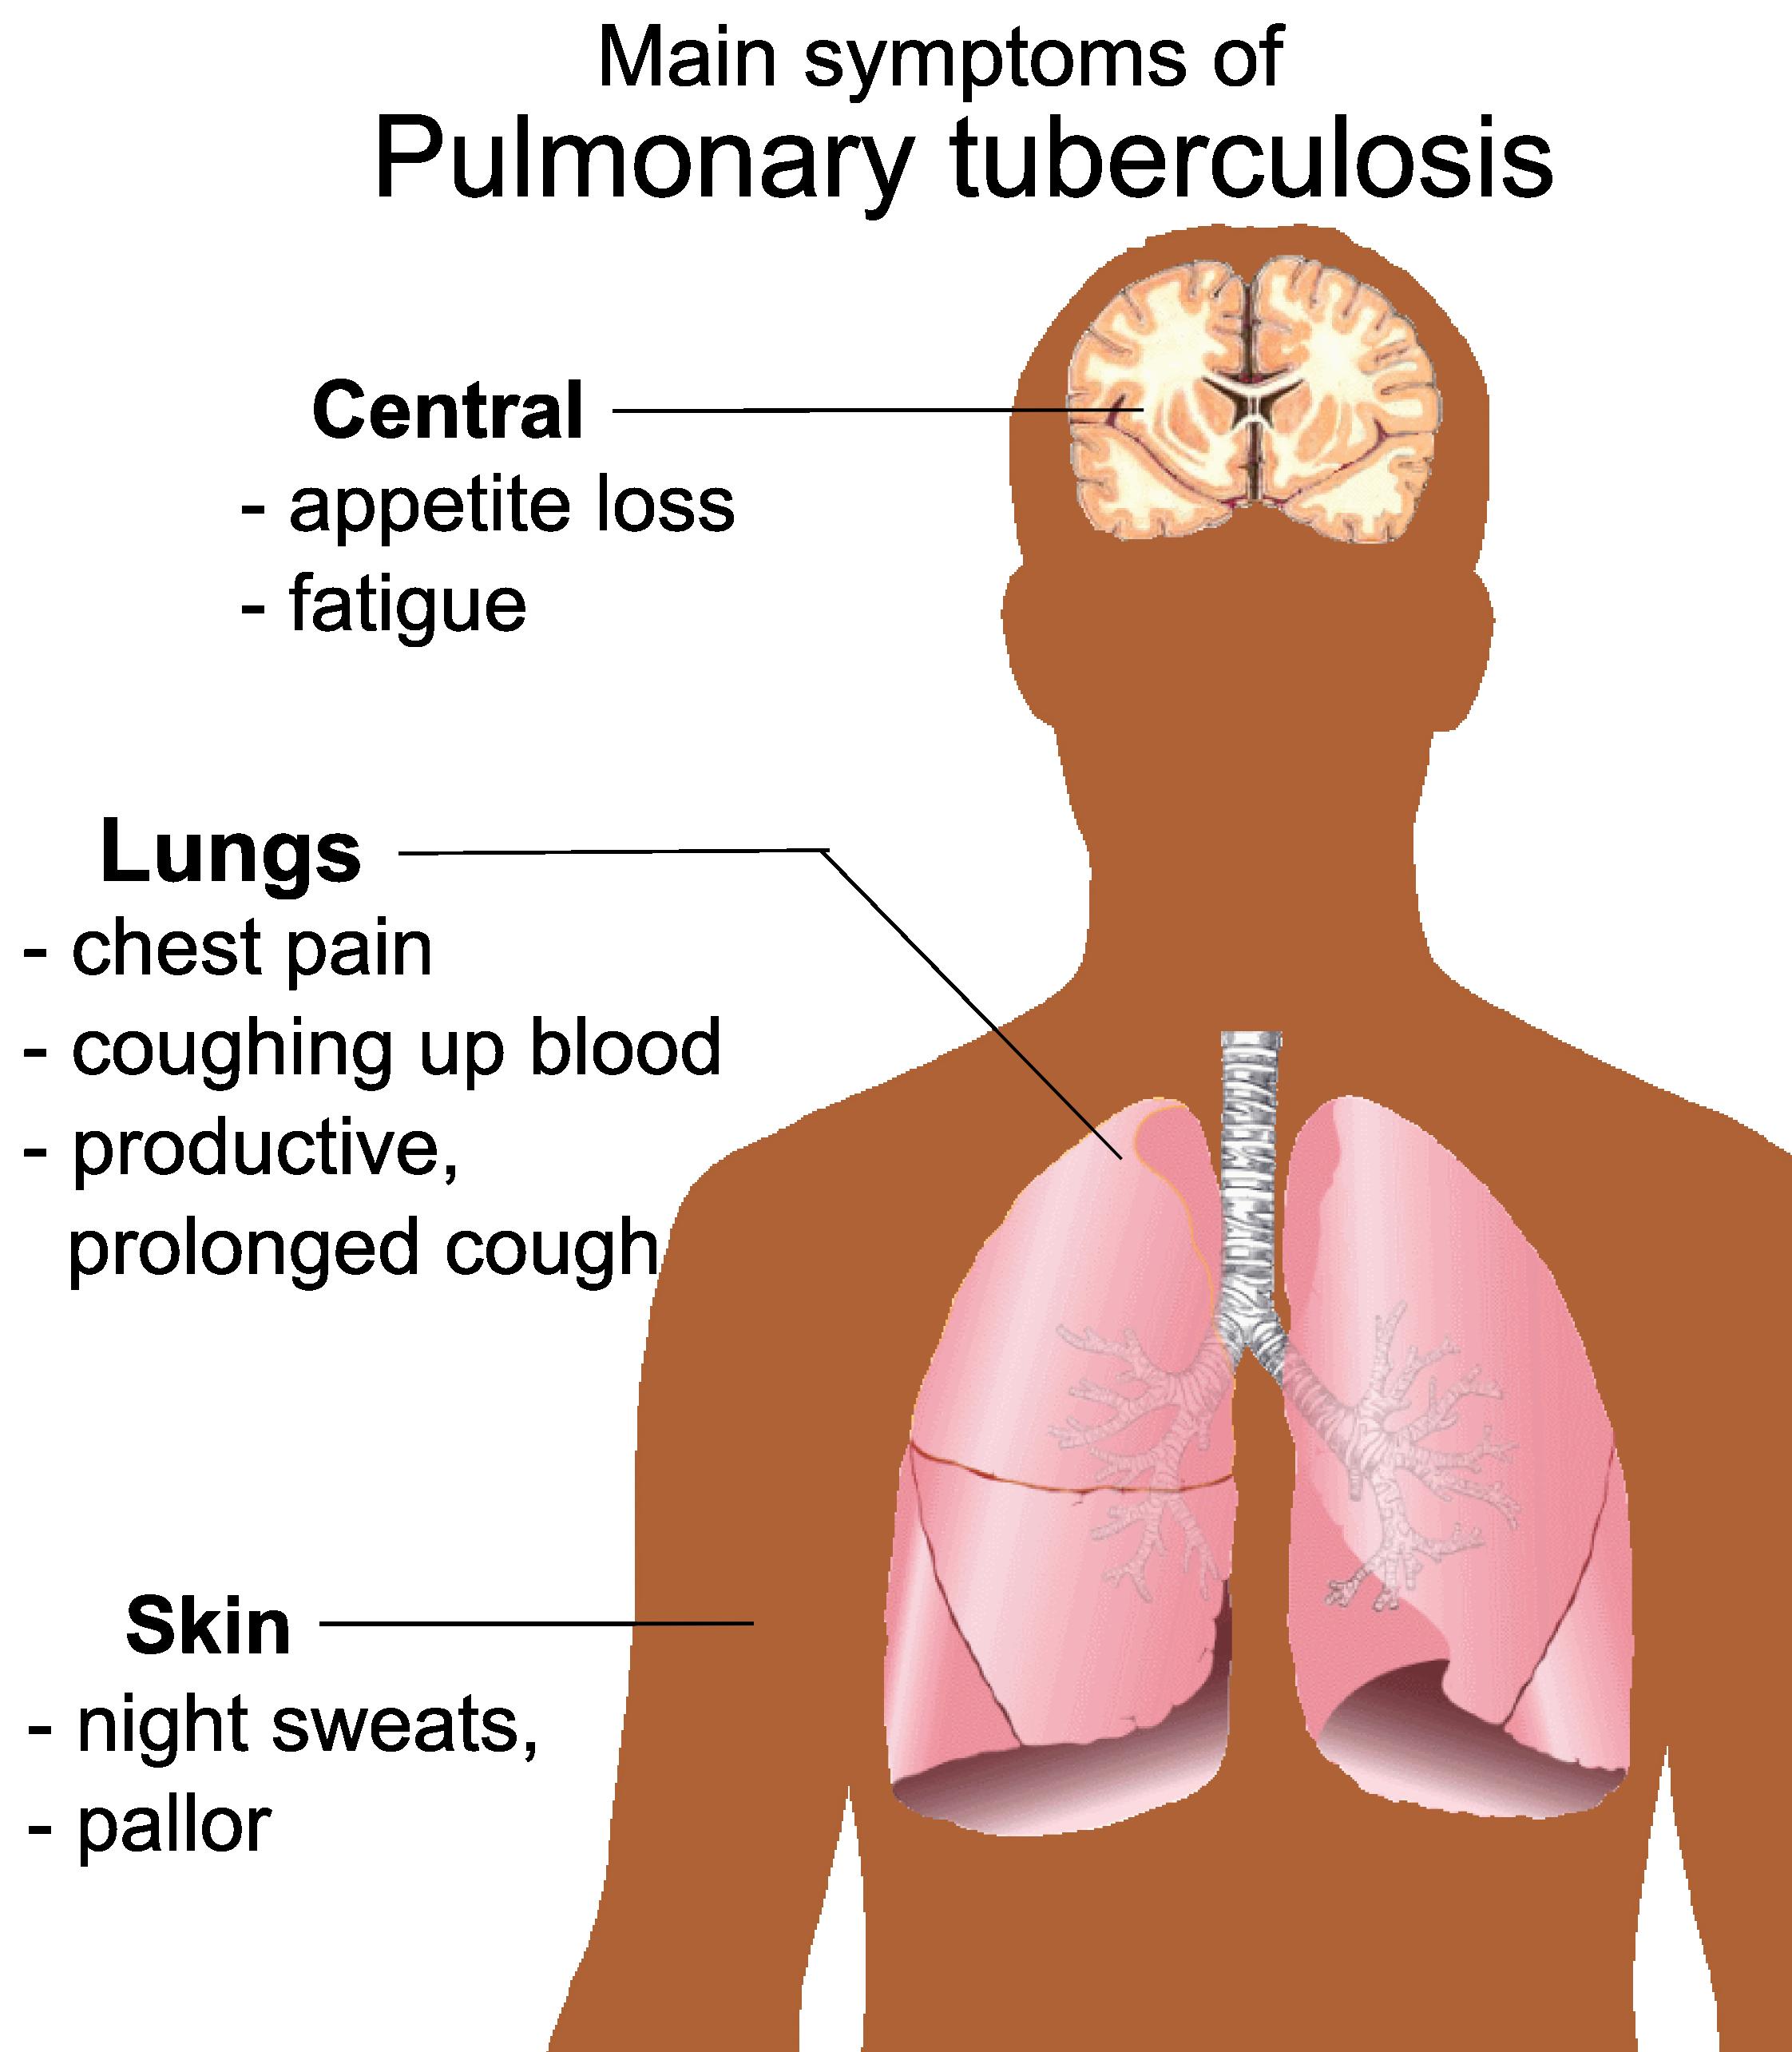 Pulmonary Tuberculosis Symptoms